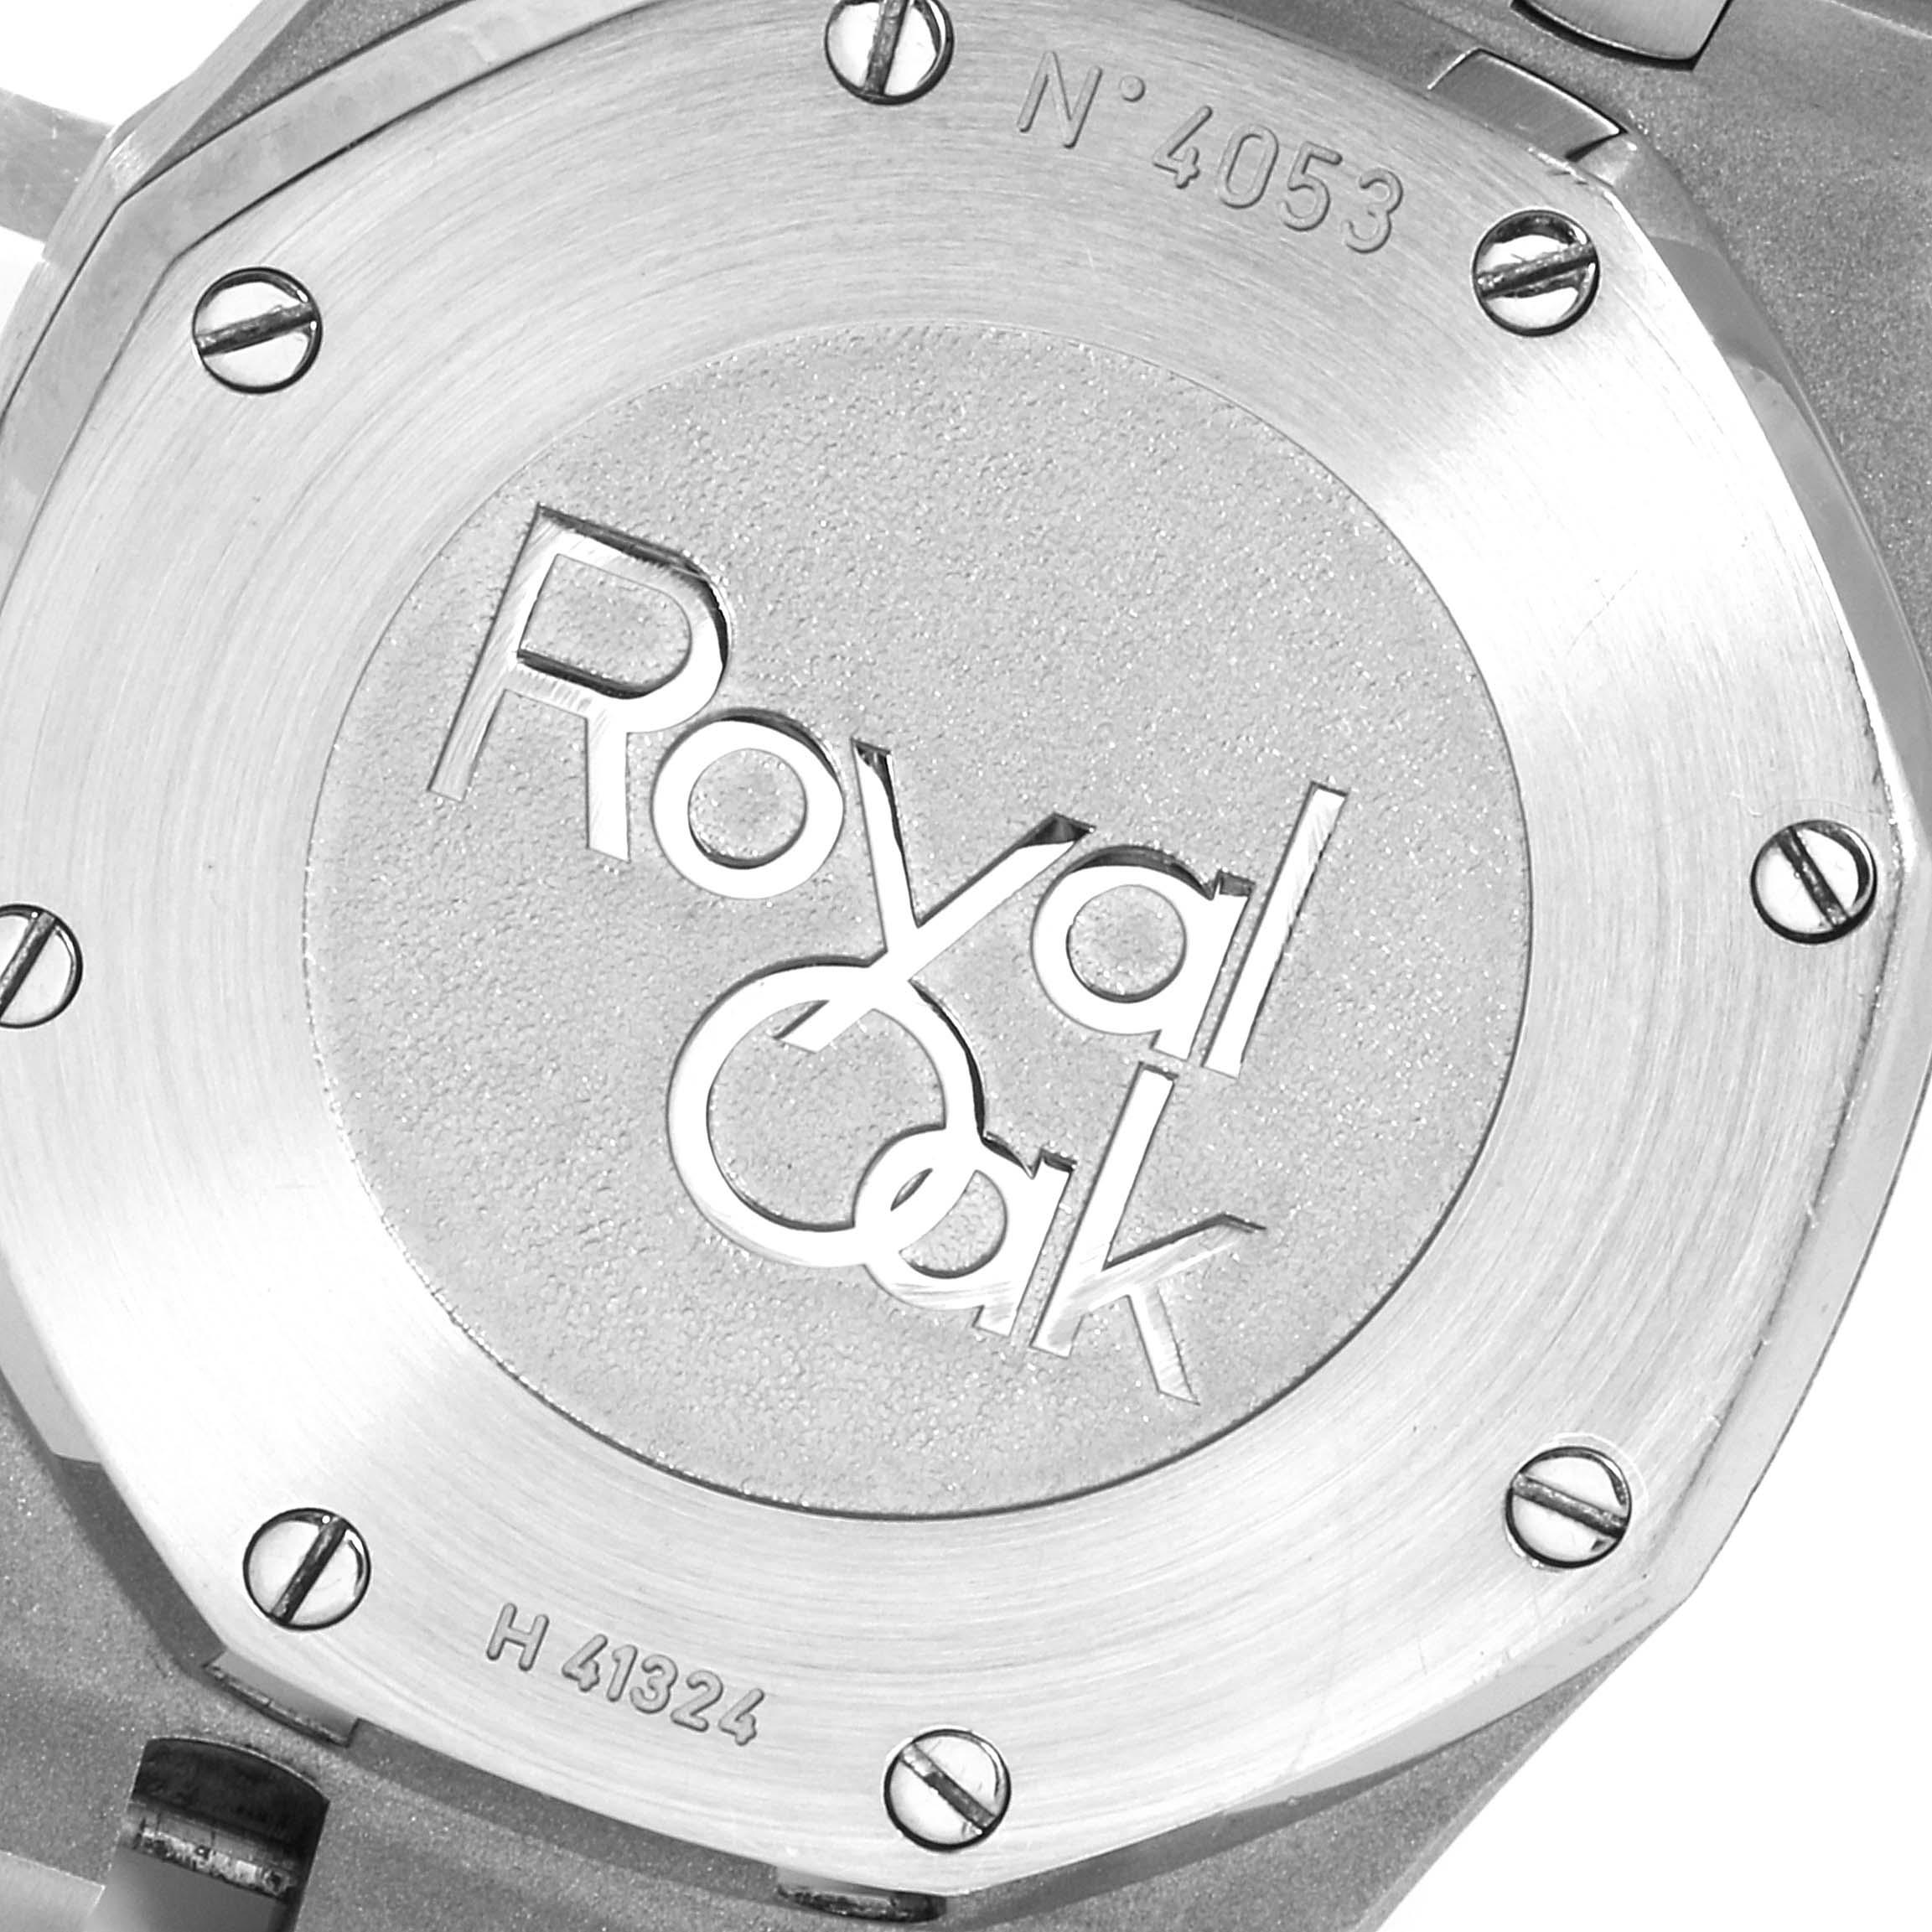 Audemars Piguet Royal Oak Dual Time Power Reserve Mens Watch 26120ST SwissWatchExpo